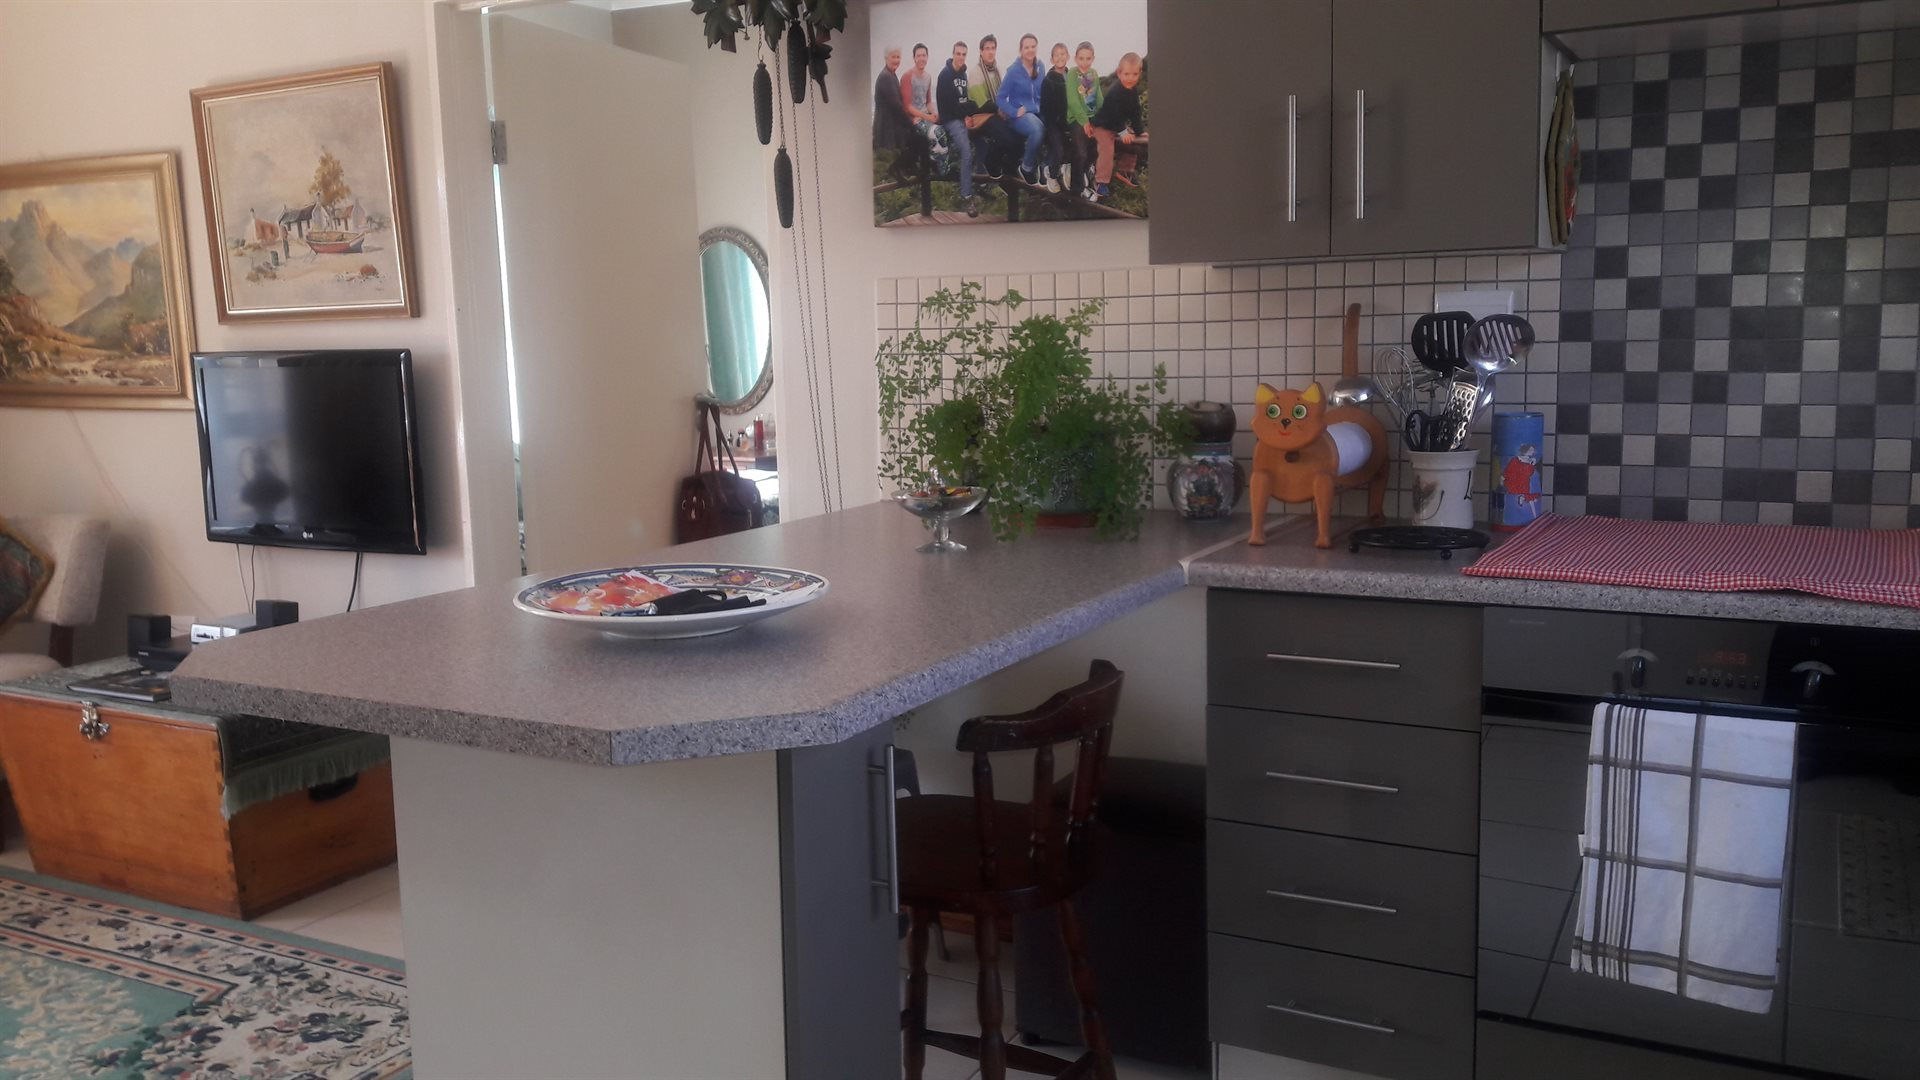 Veld En Vlei property for sale. Ref No: 13504973. Picture no 4